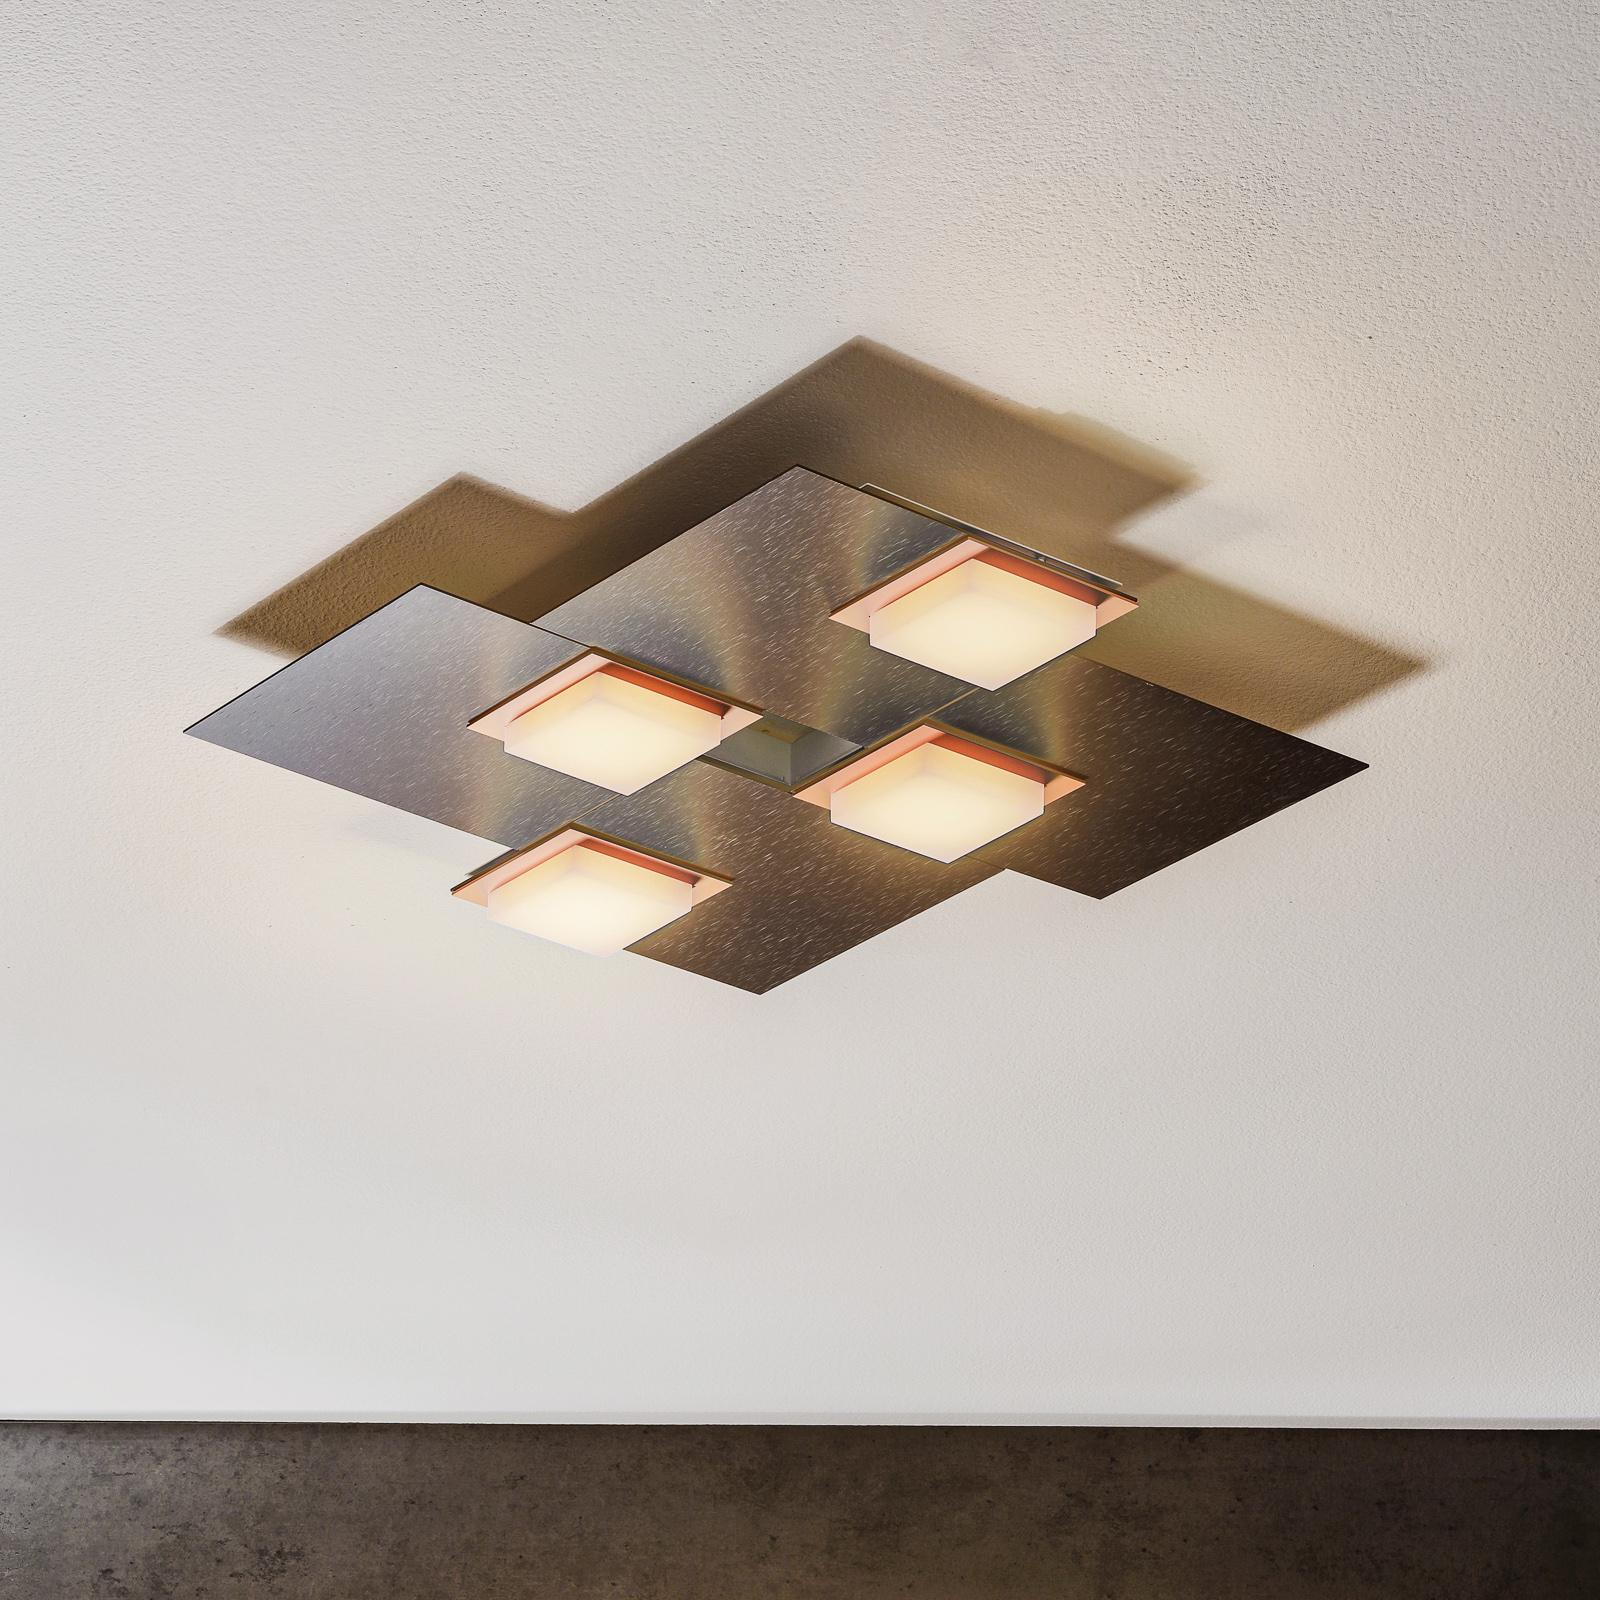 BANKAMP Quadro LED-loftlampe 32 W, antracit